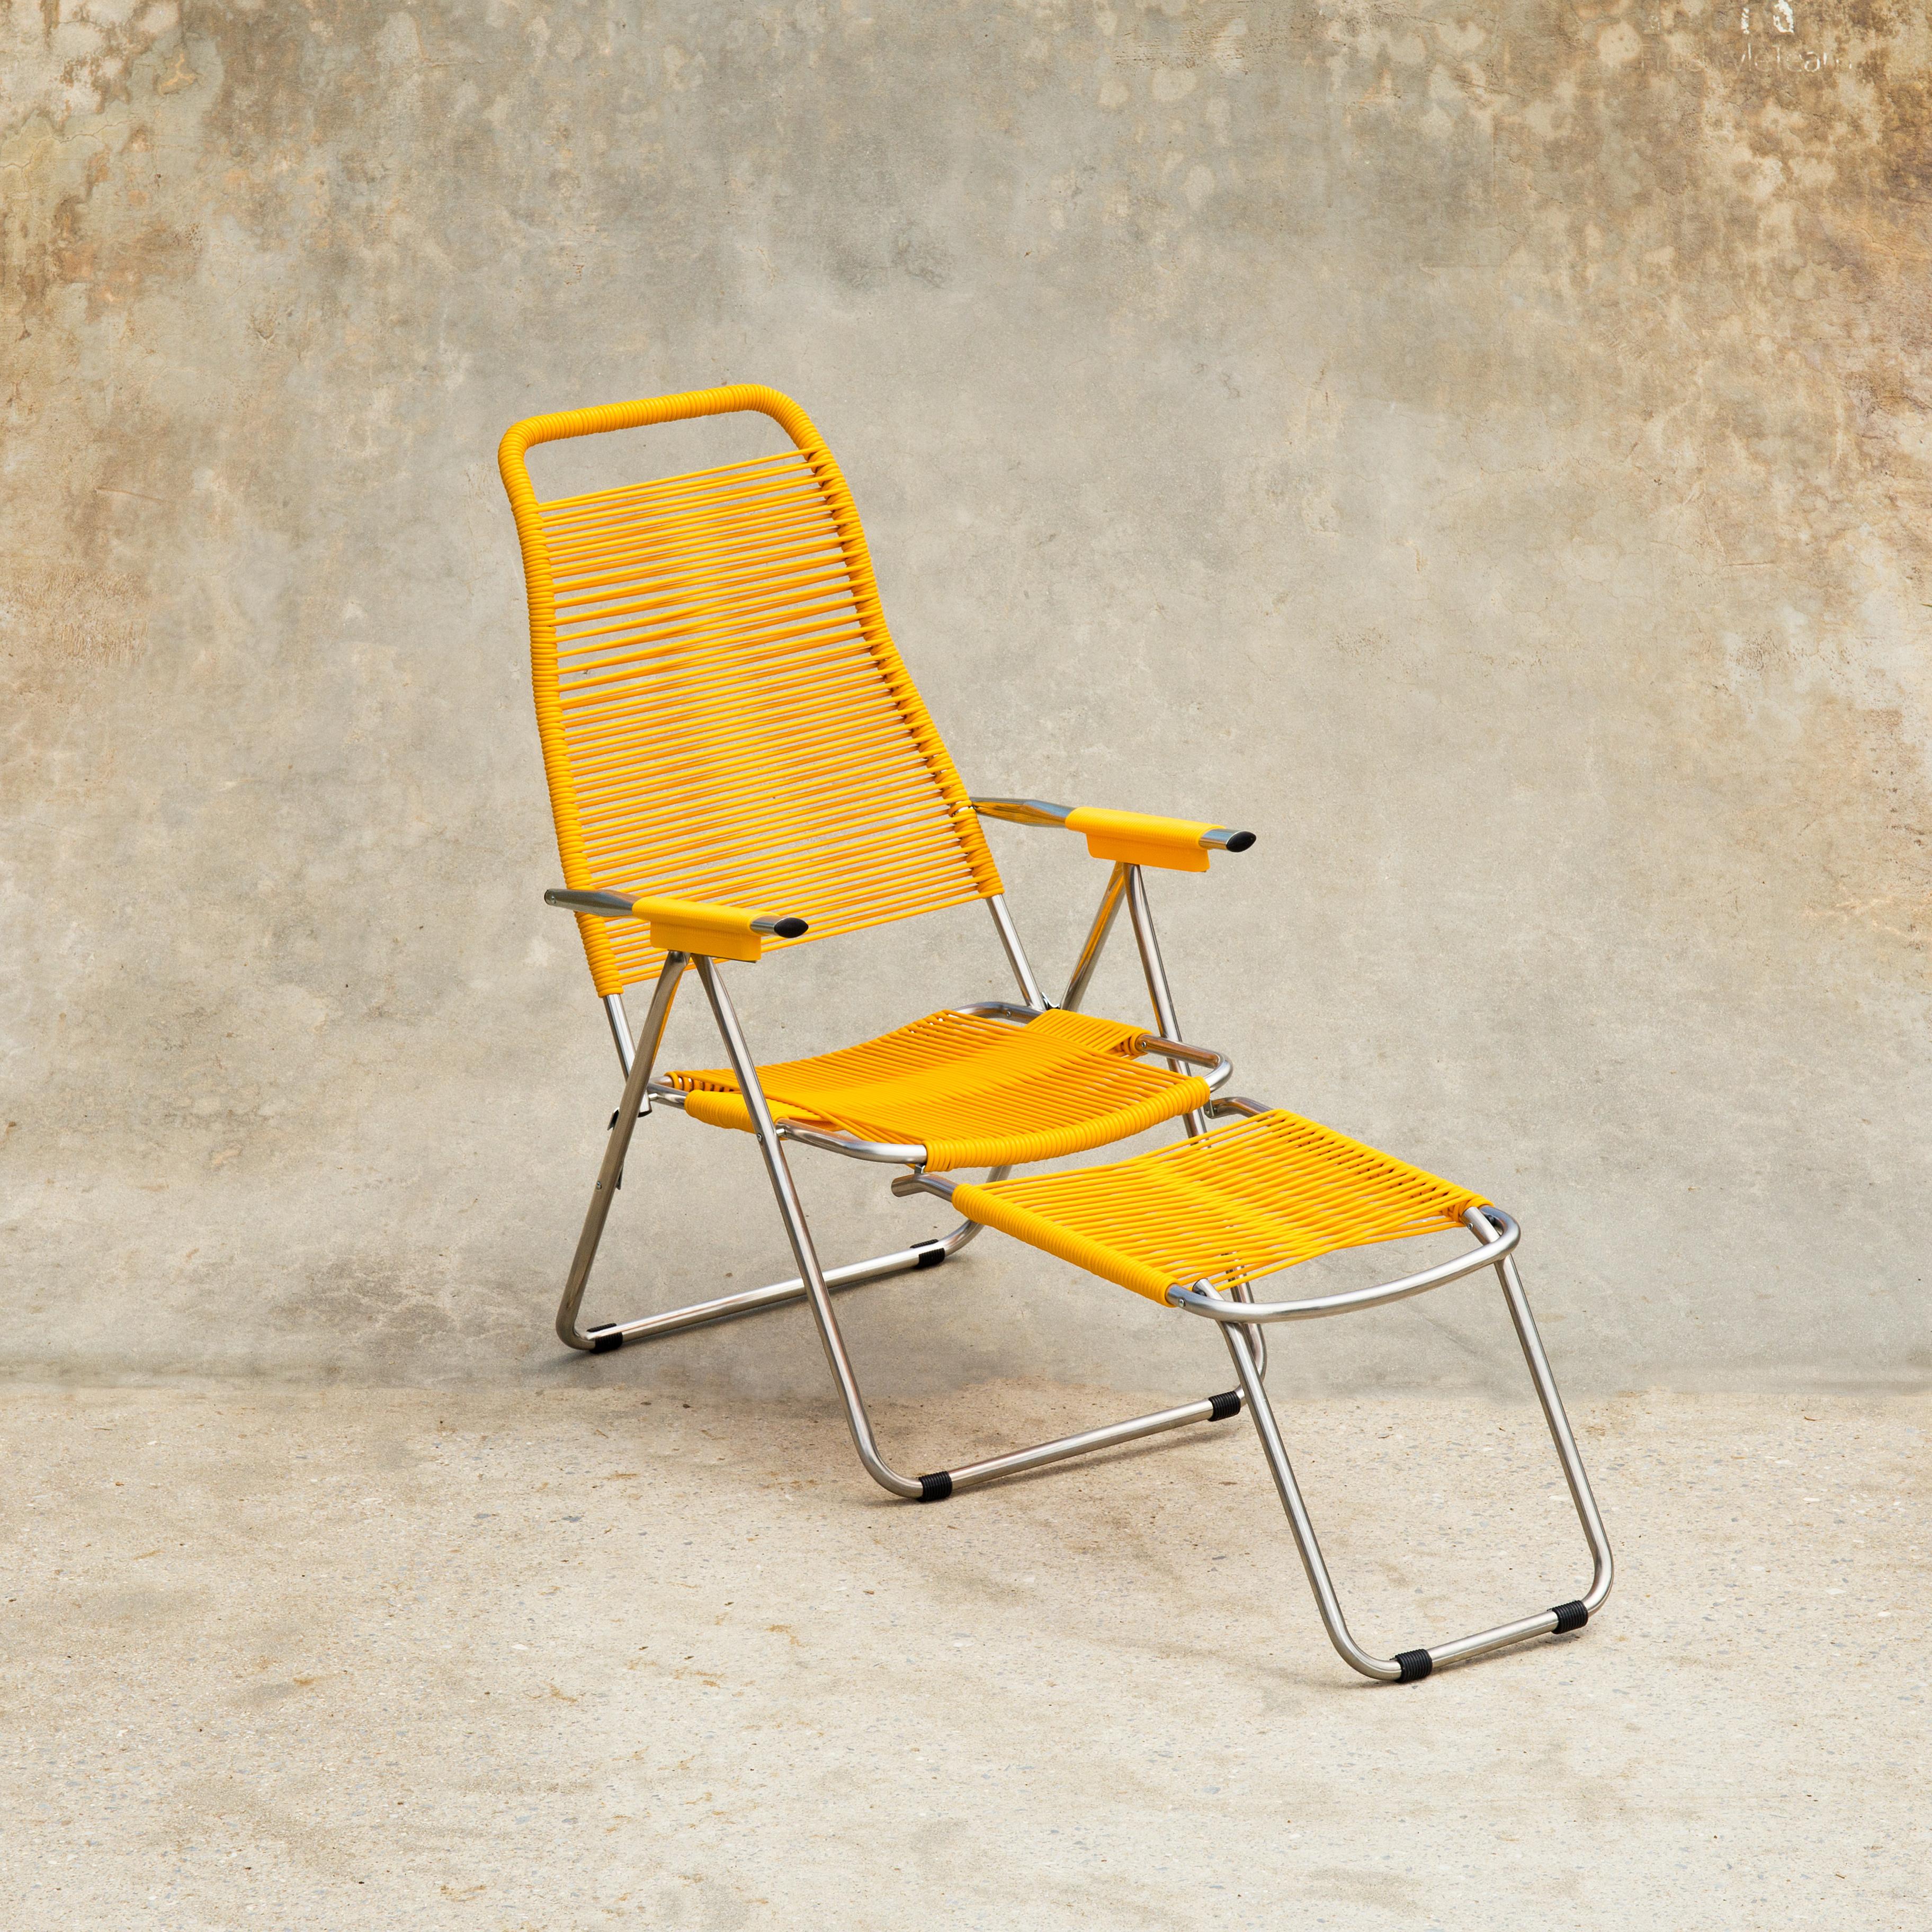 Spaghetti Outdoor Lounge Chair